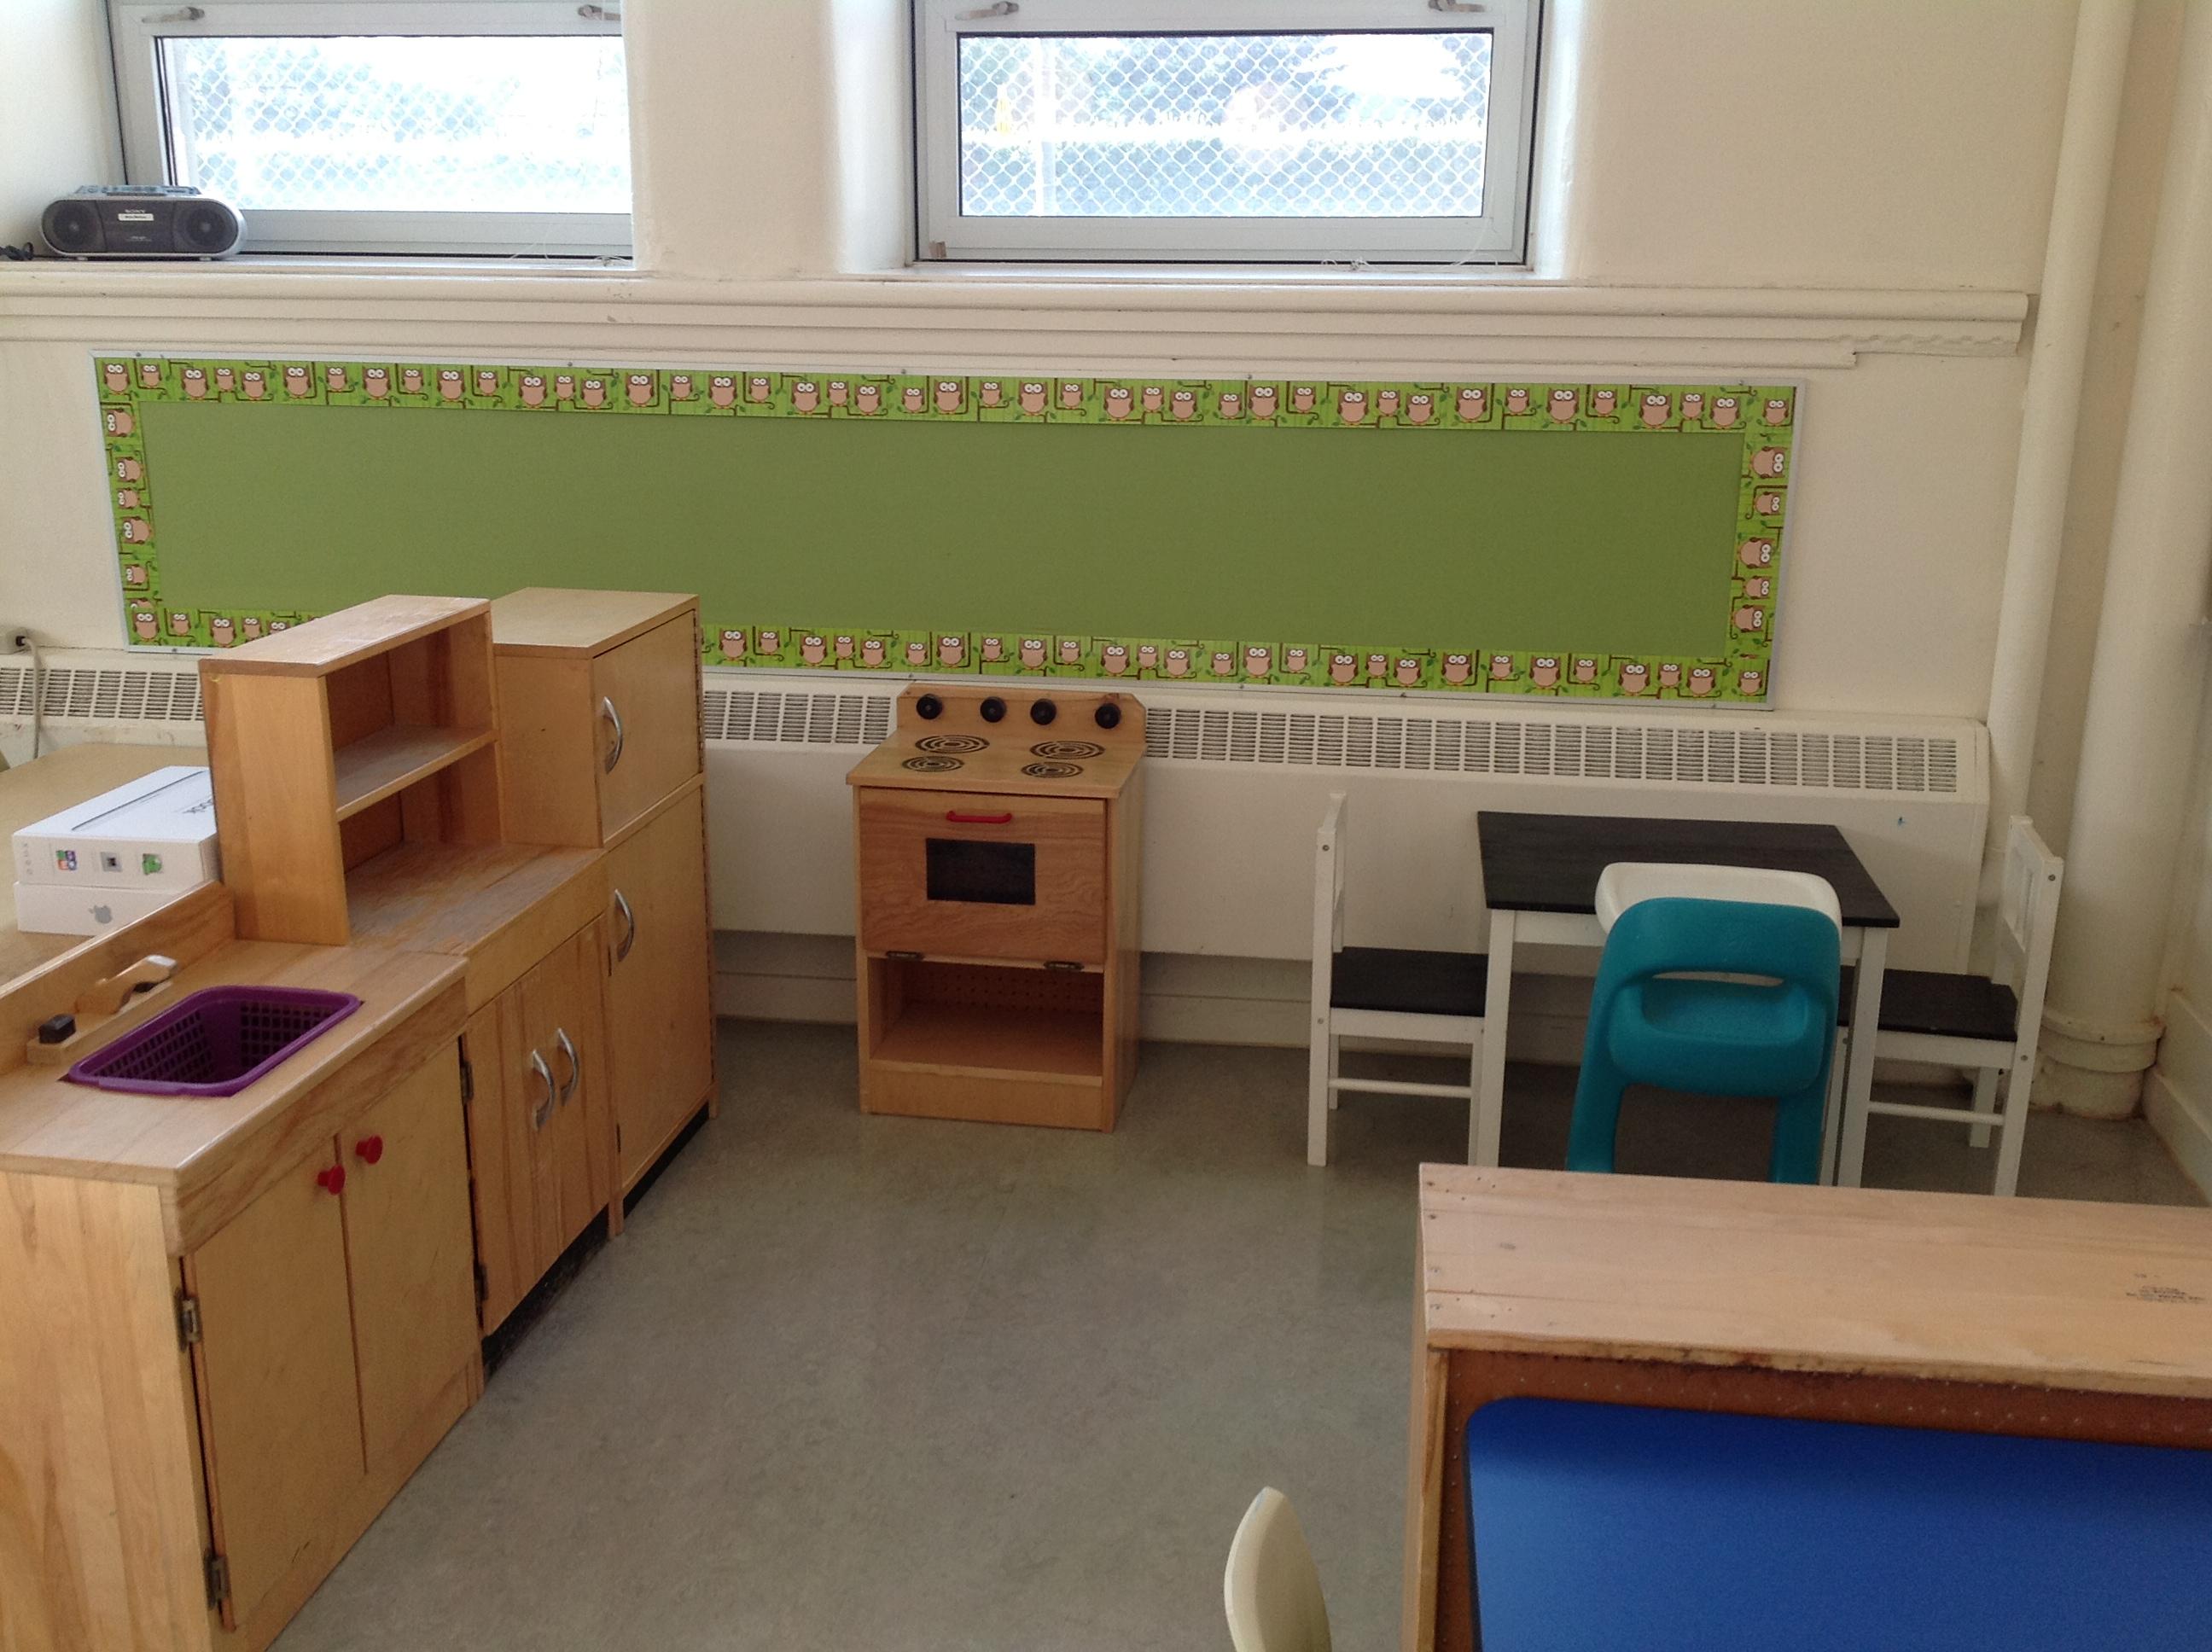 Classroom Kitchen Ideas ~ My classroom « hurray for play